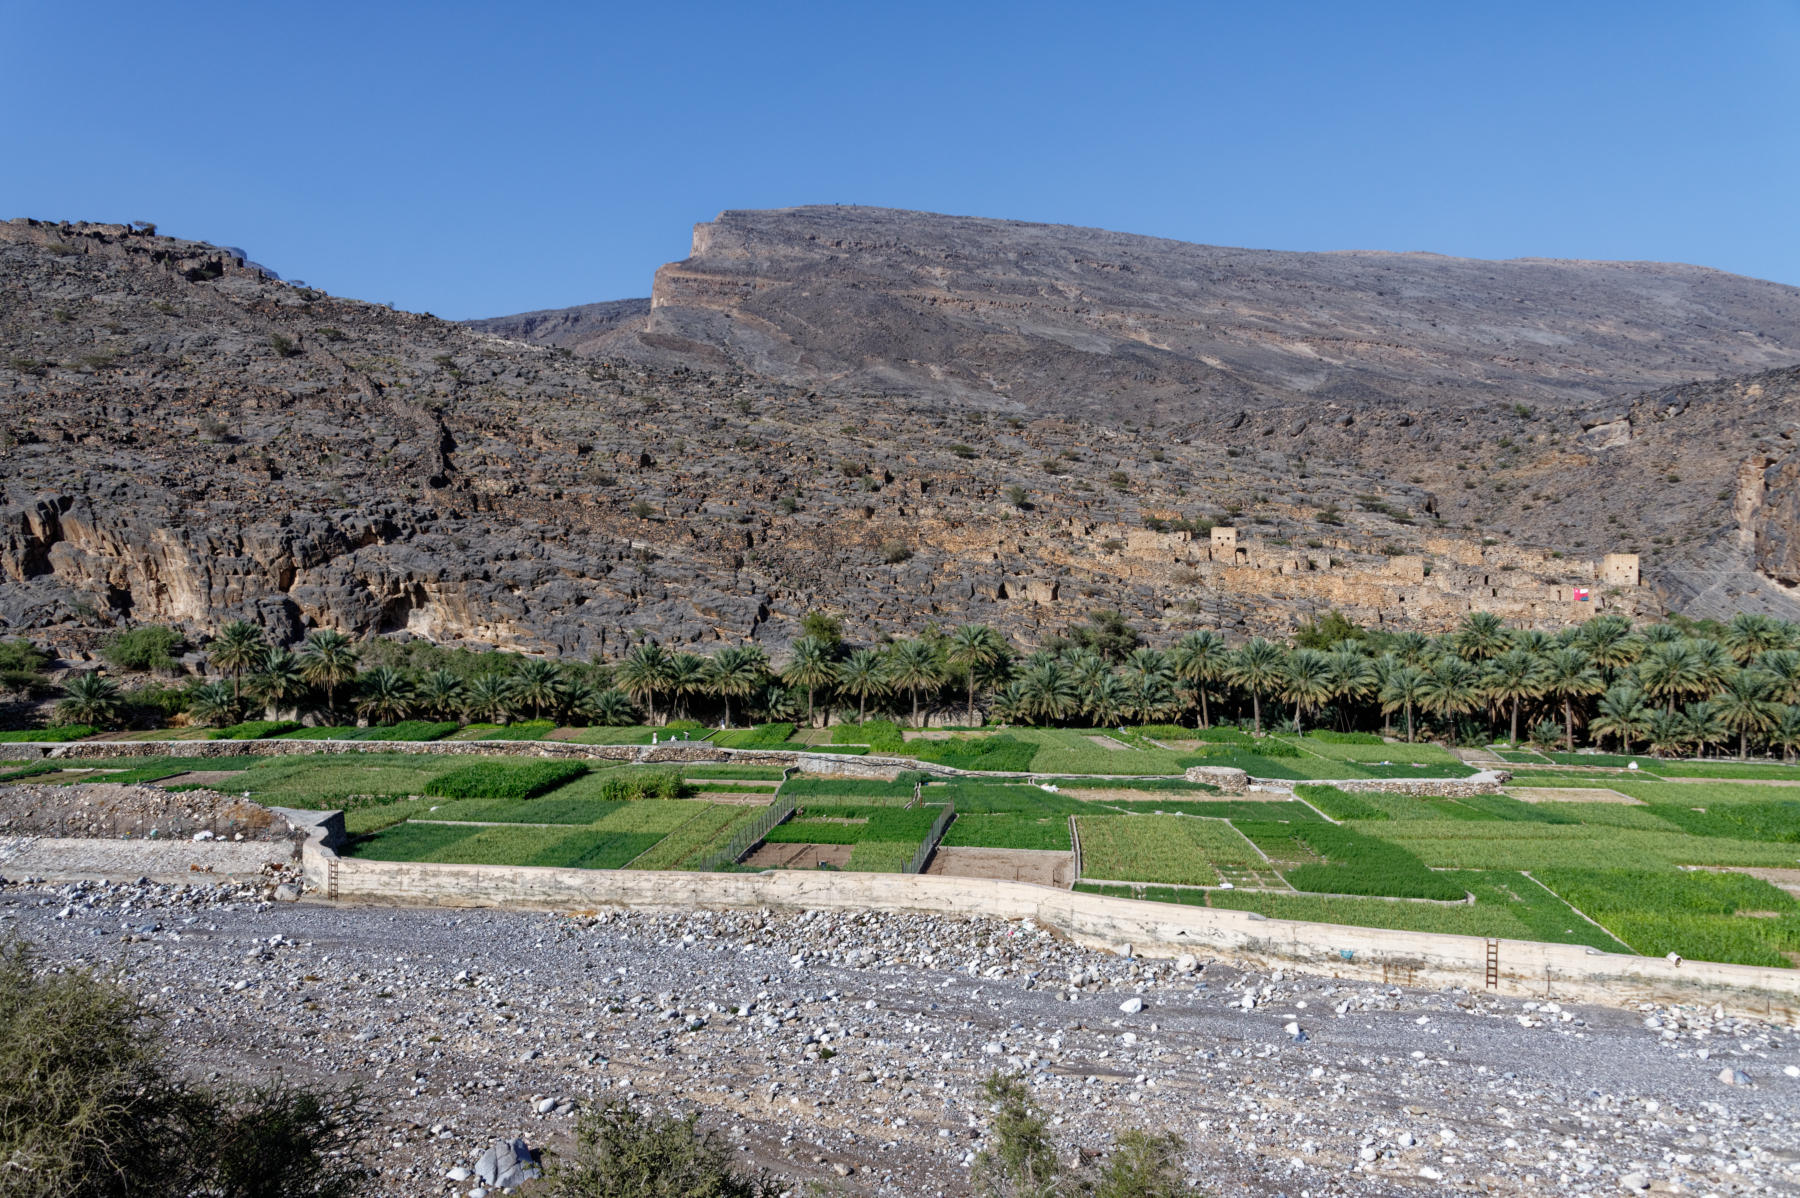 Wadi Ghul, Oman, abandoned village